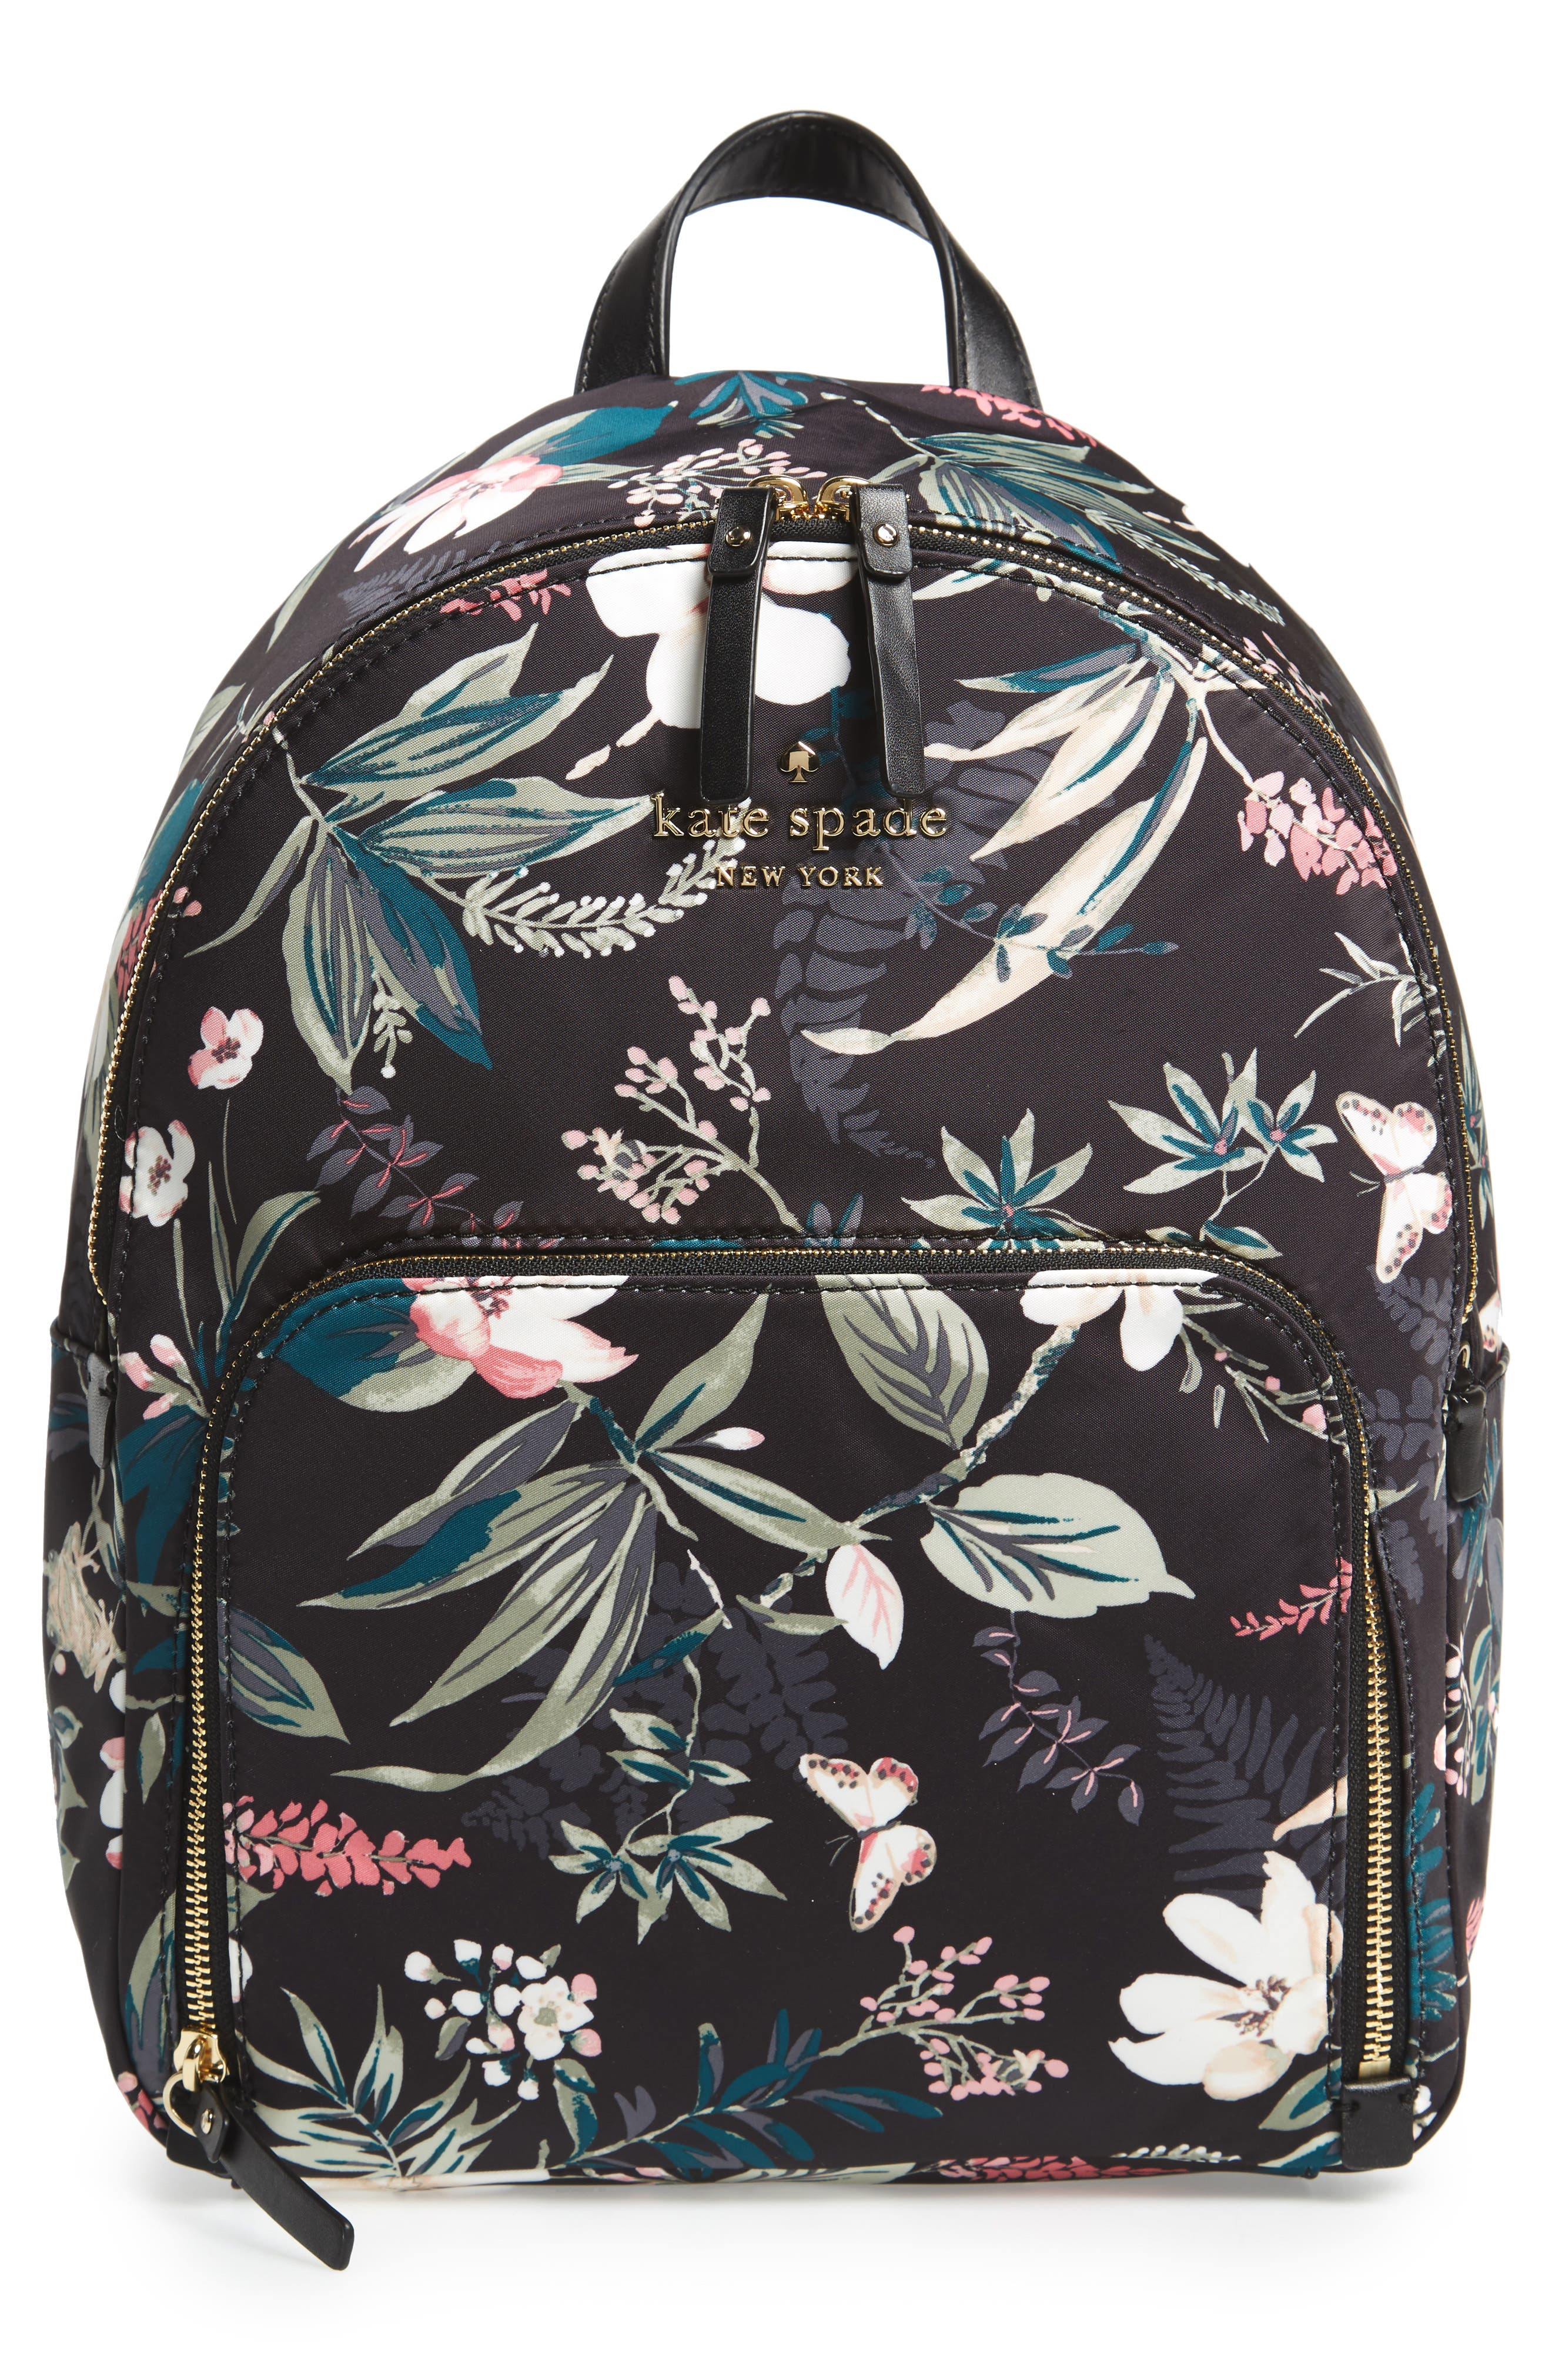 d0859f4ebd6a Kate Spade Watson Lane - Botanical Hartley Nylon Backpack - Black In Black  Multi